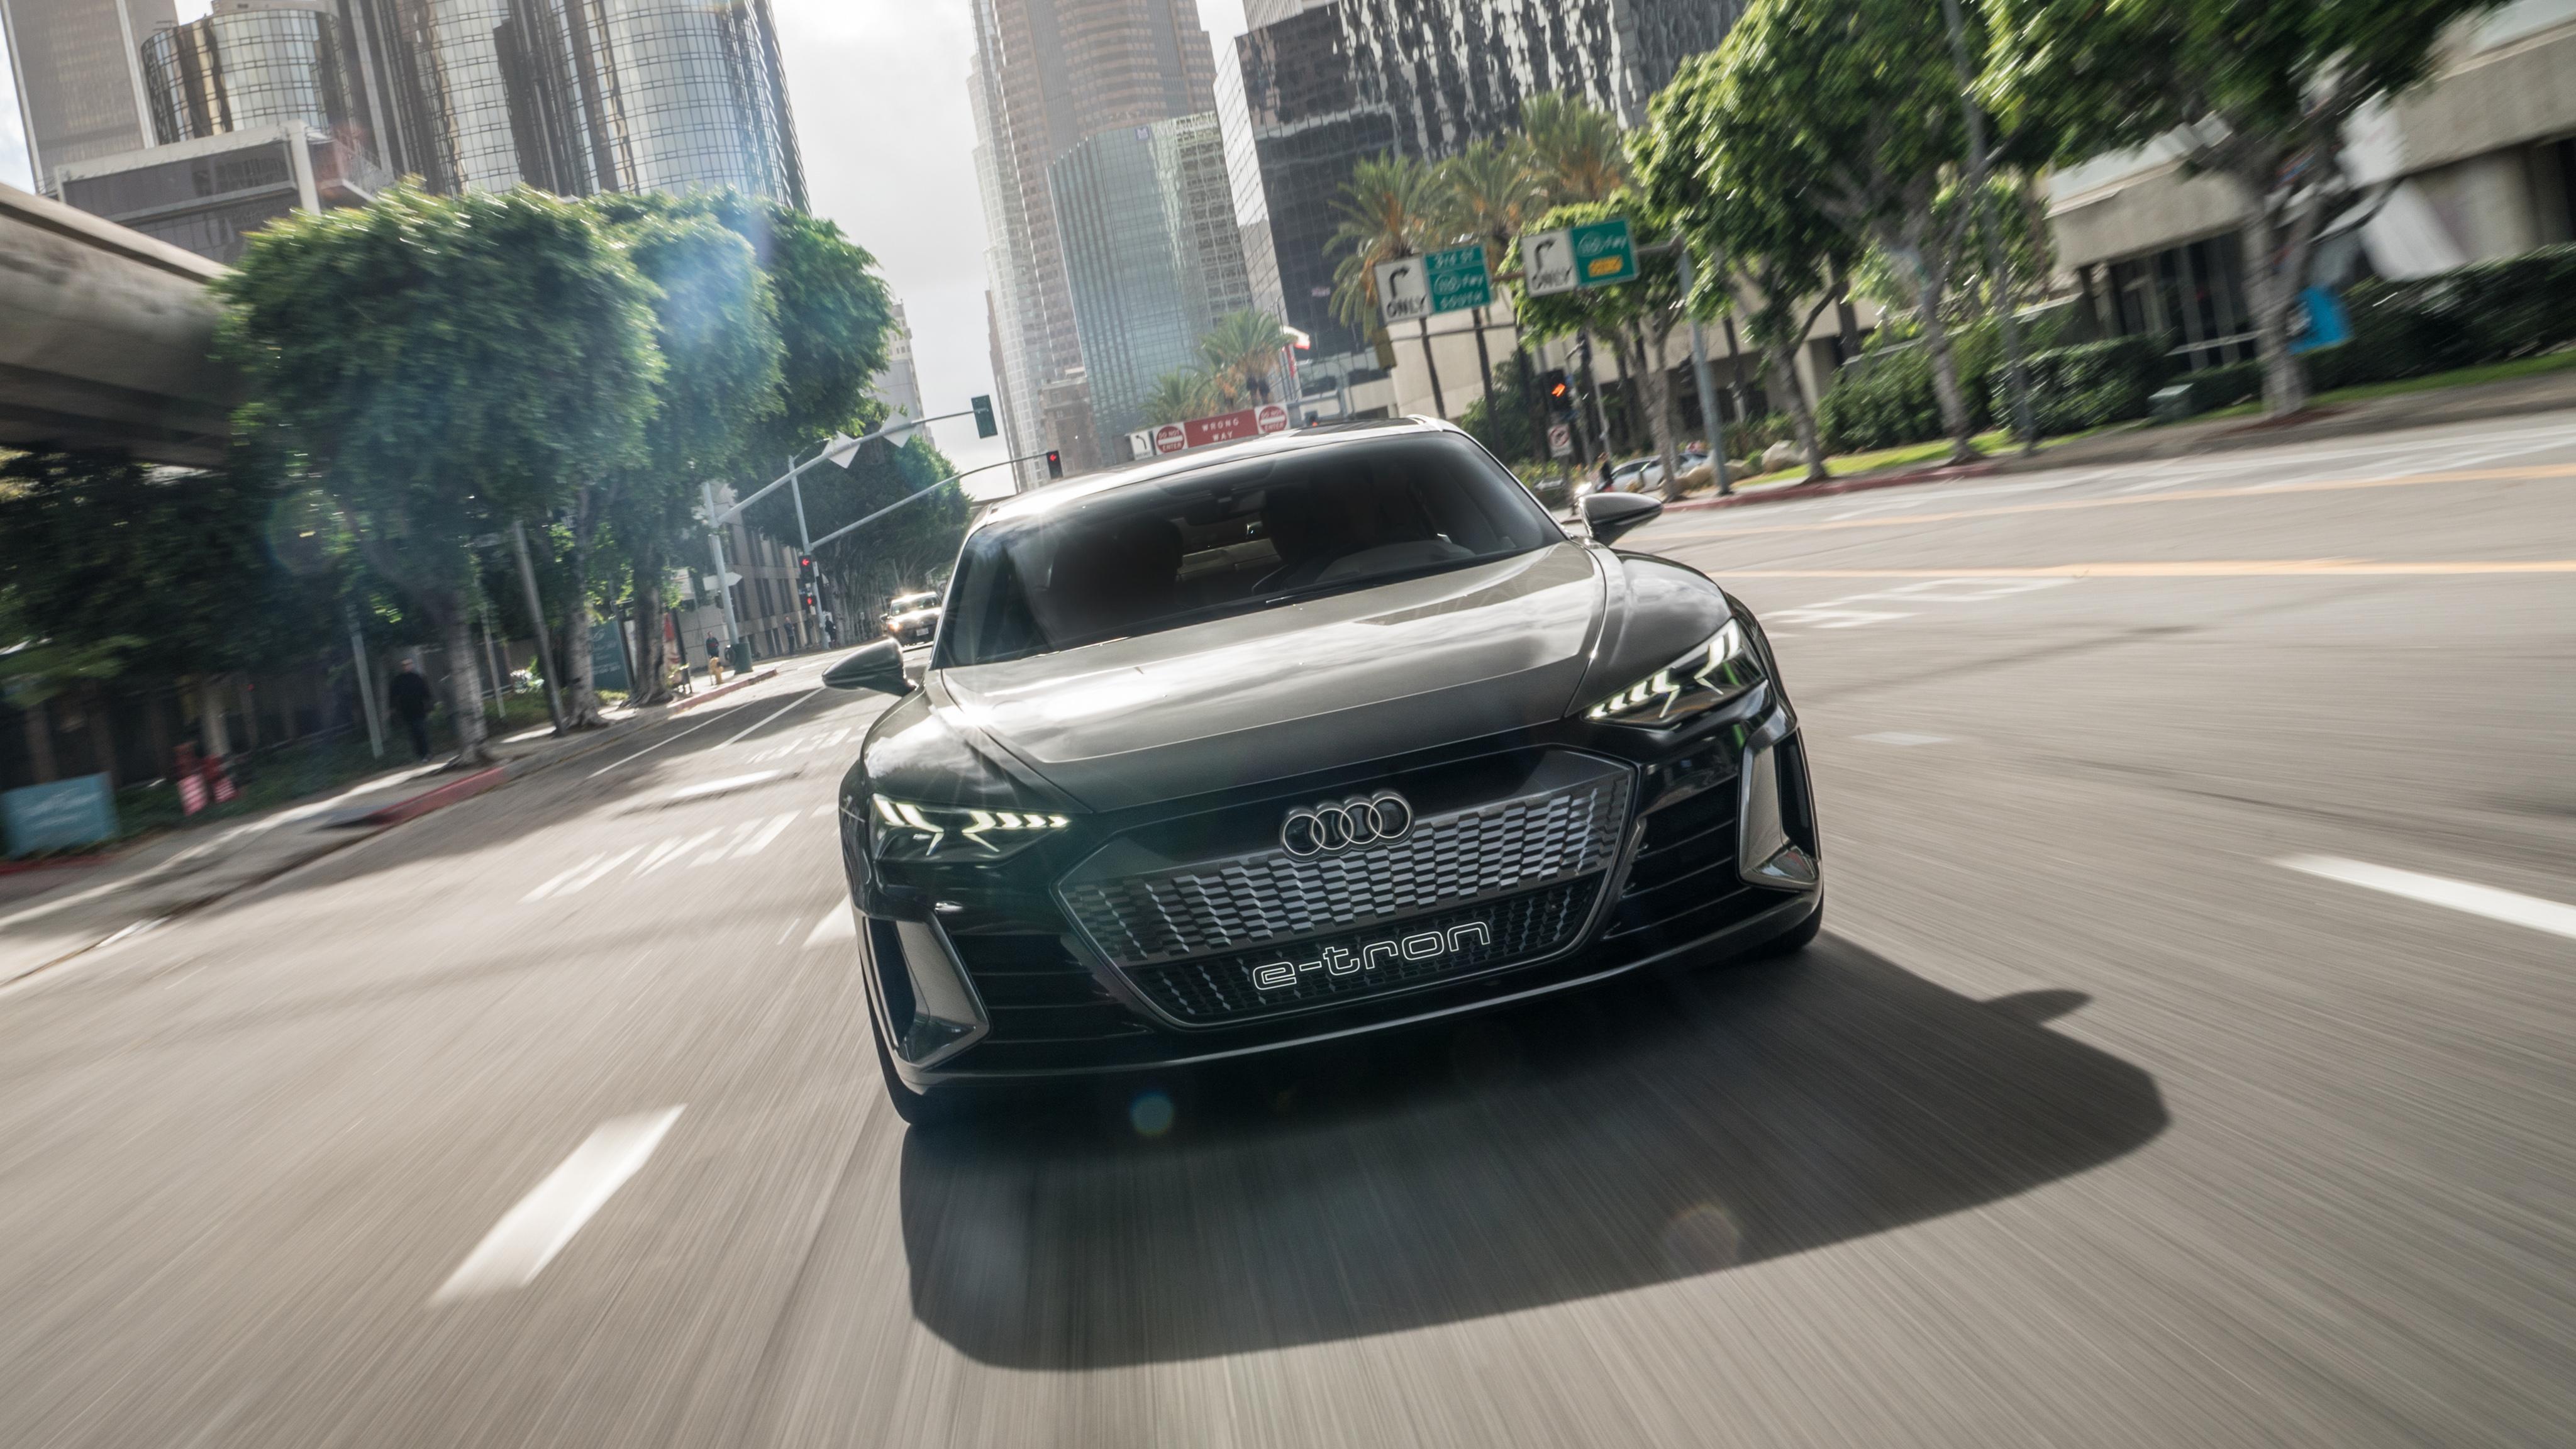 Audi e-tron GT Concept 2019 4K Wallpaper   HD Car ...